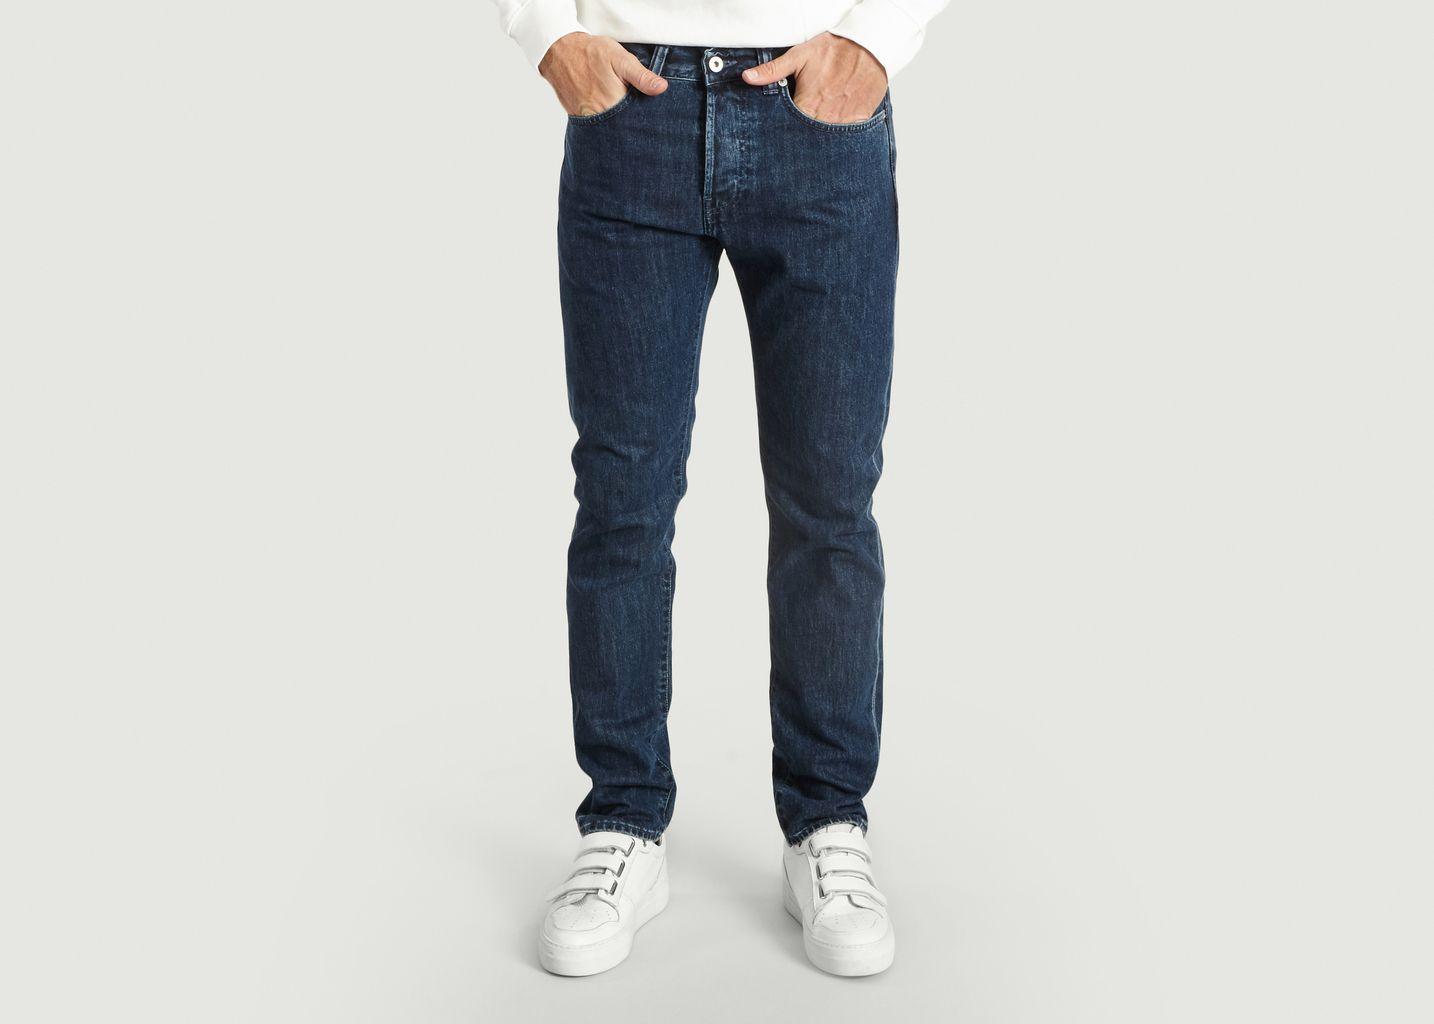 Jean ED-80 Slim Tapered Jeans - Edwin